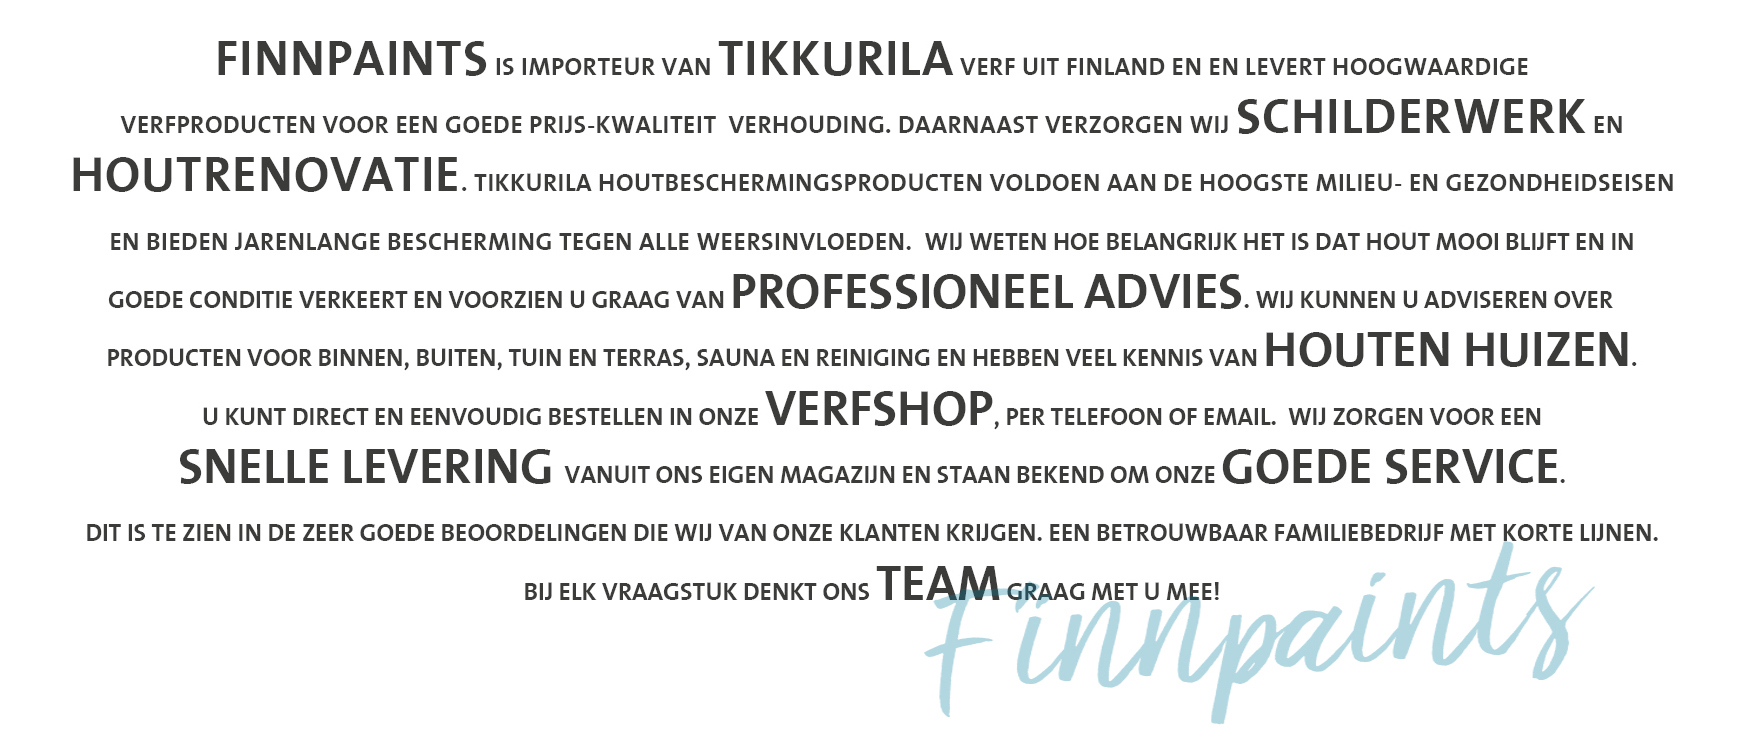 Finnpaints.nl | Home | Woordwolk | Tikkurila